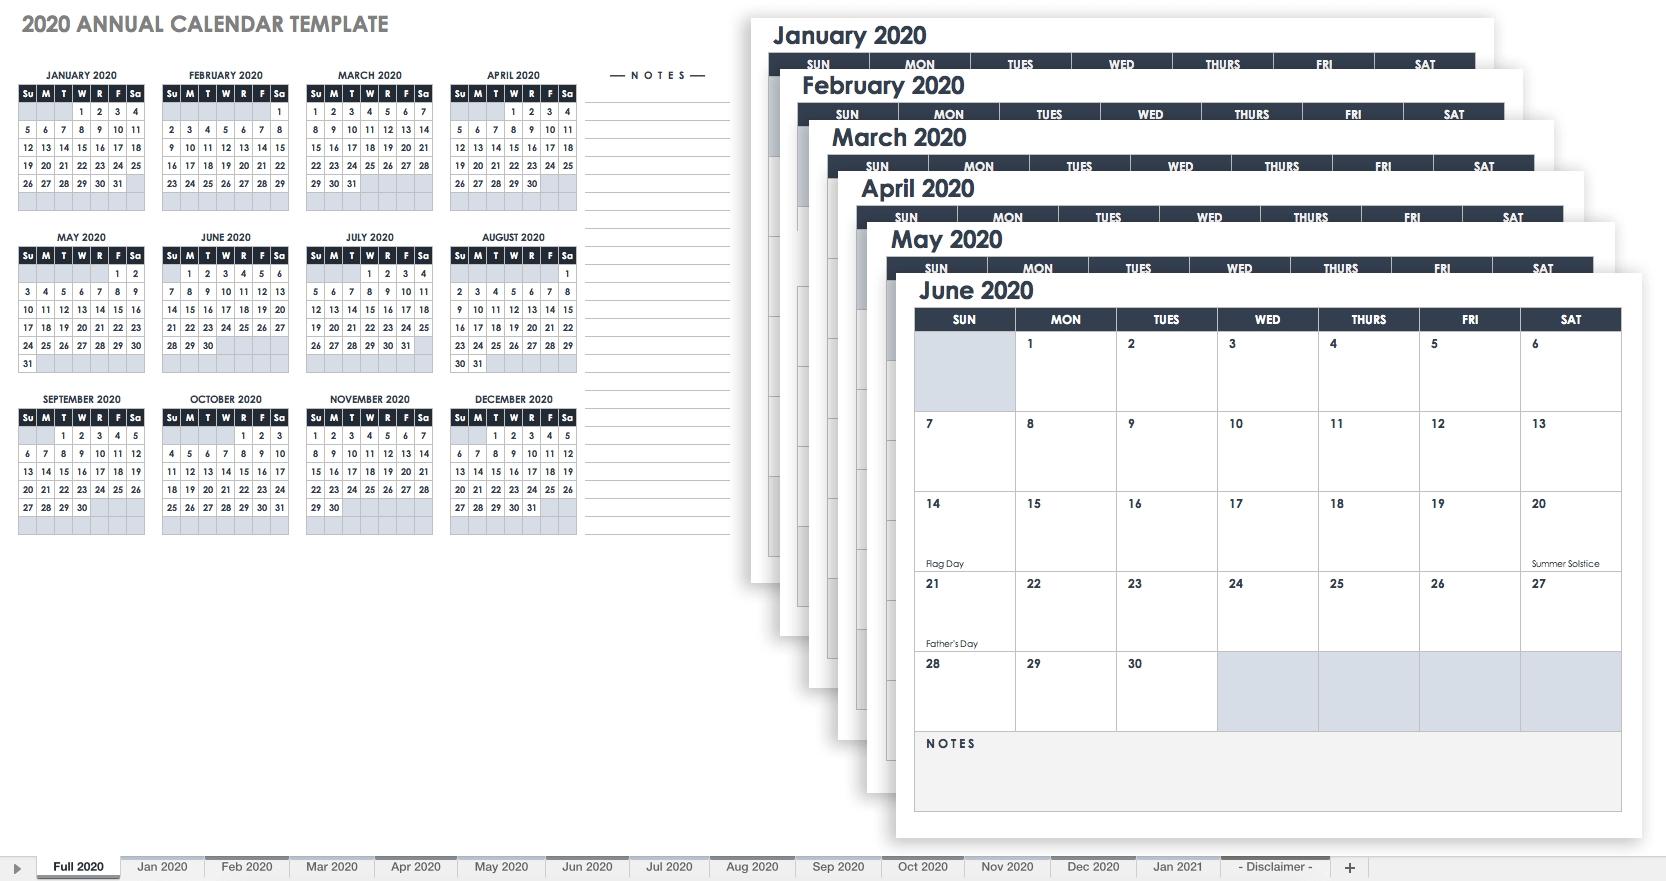 Blank Weekly Hourly Calendar 8 10